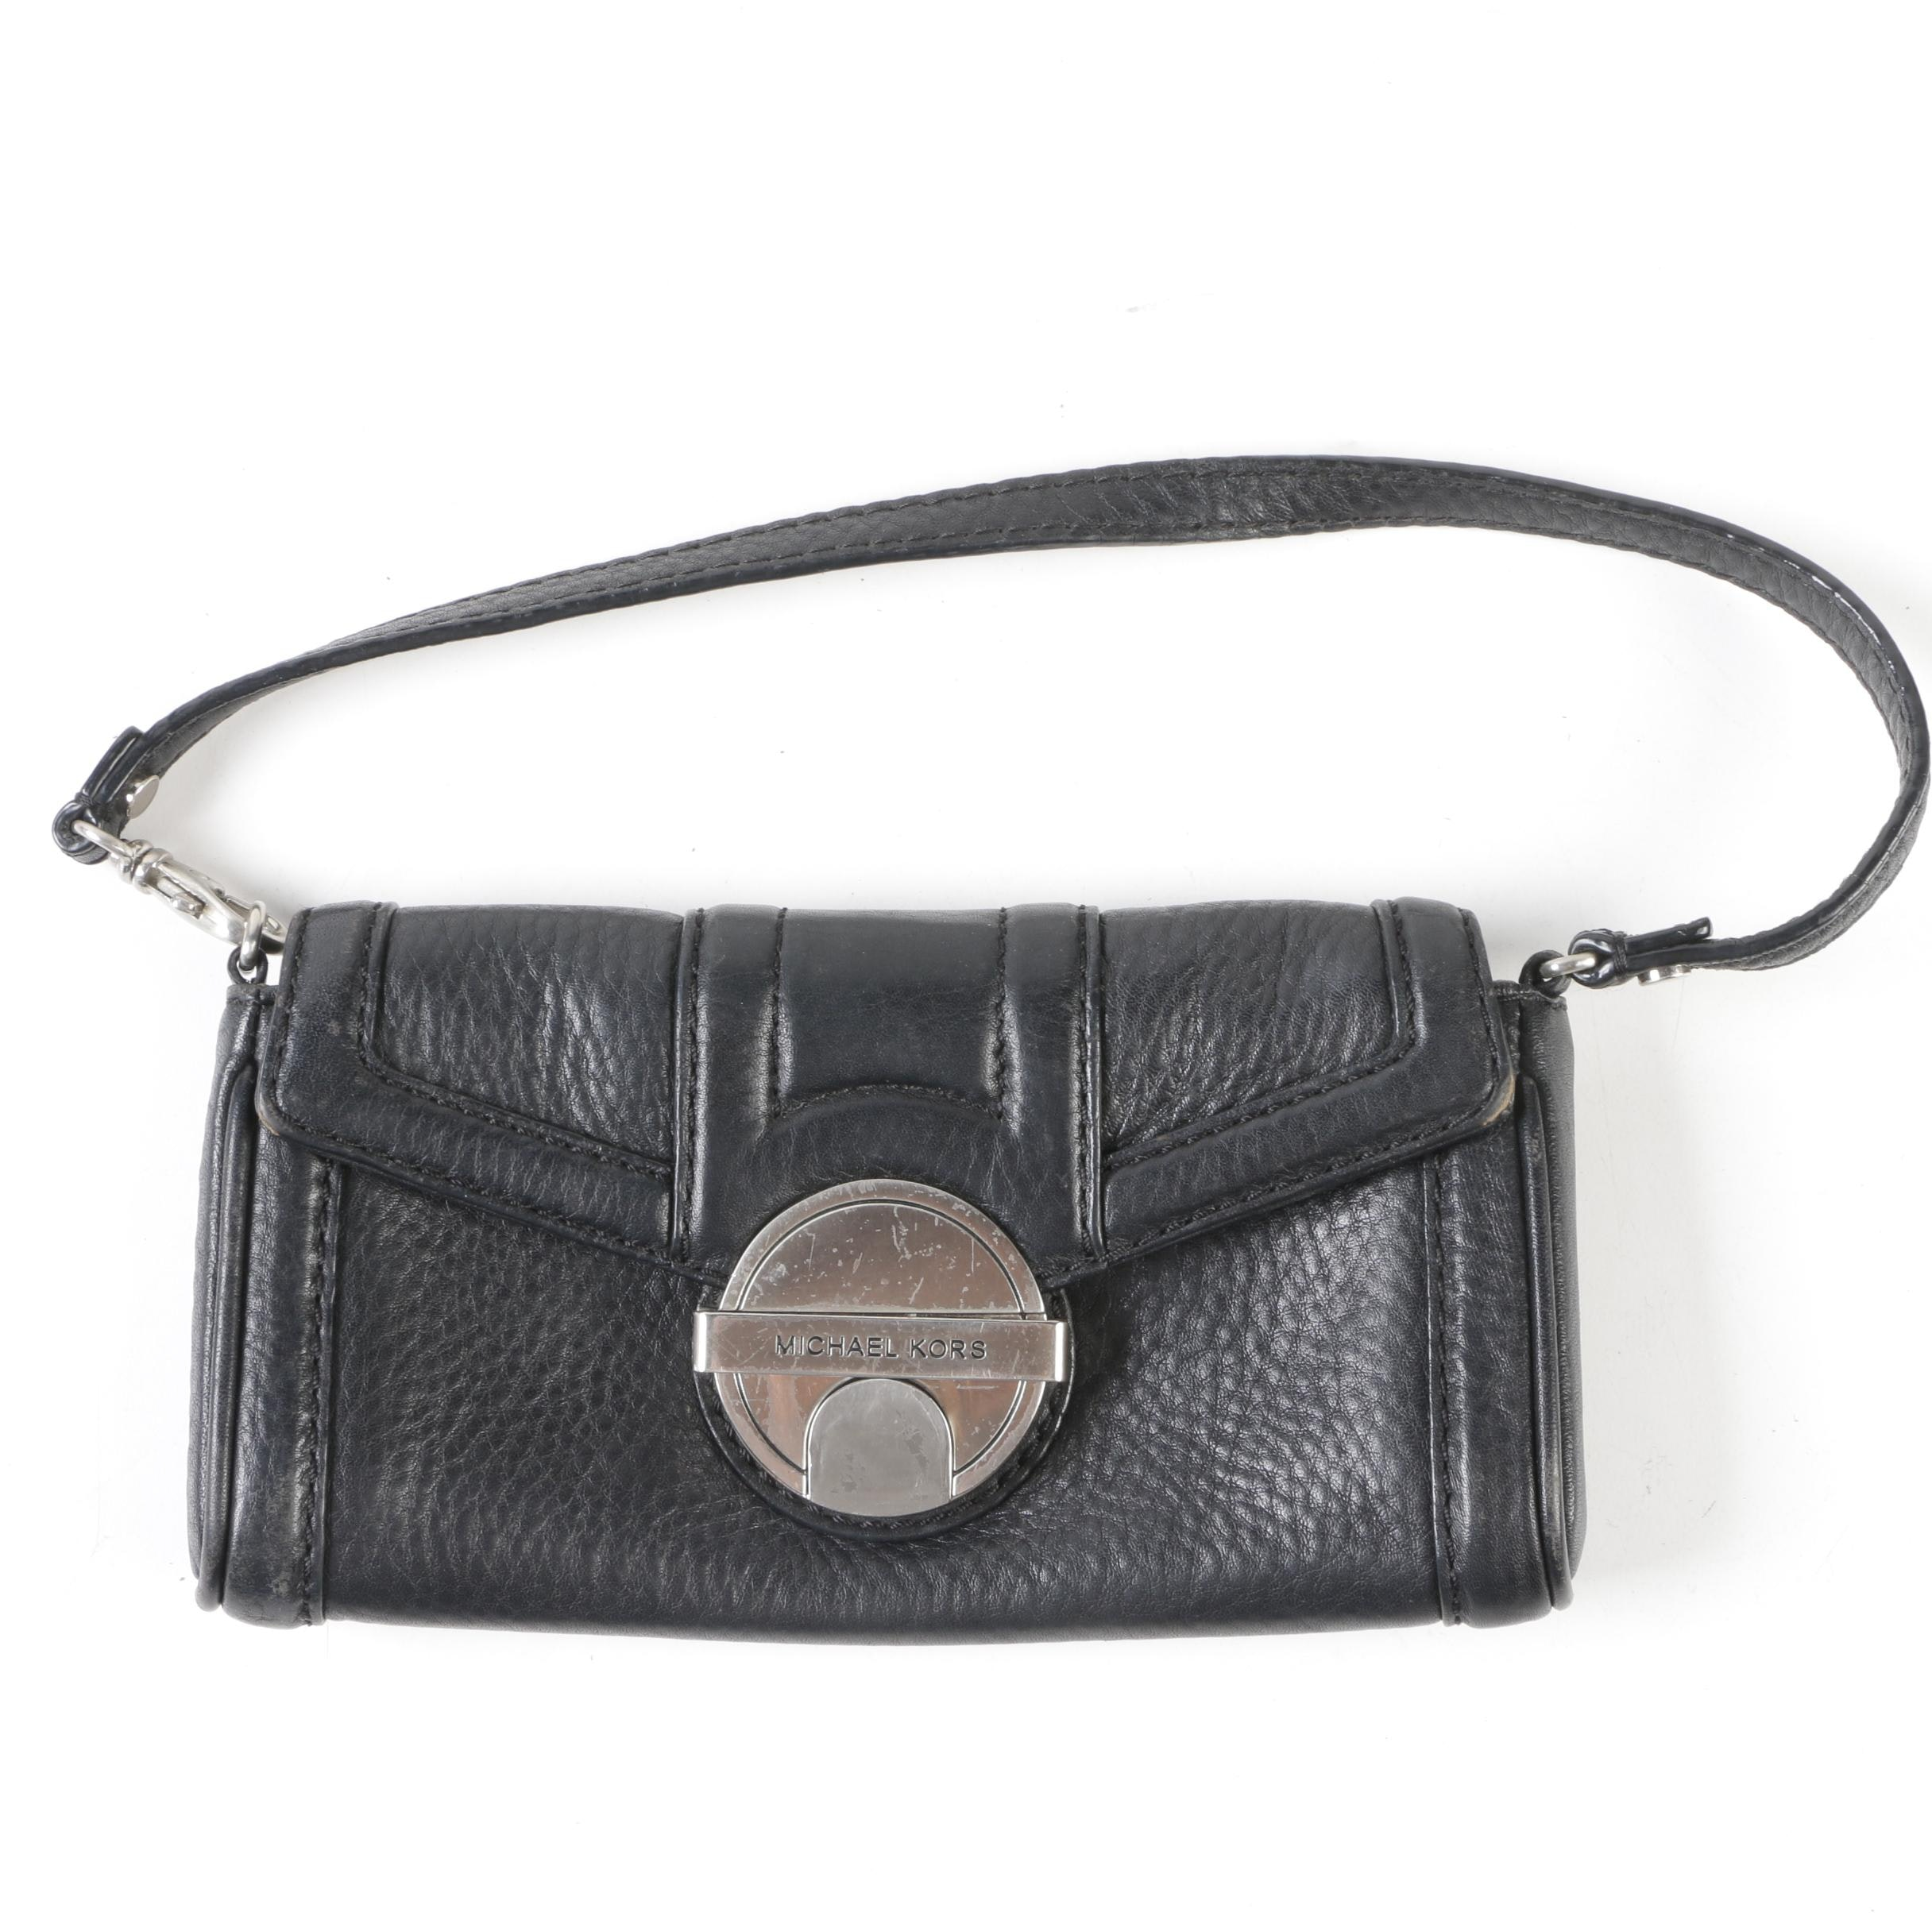 MICHAEL Michael Kors Black Pebbled Leather Mini Handbag